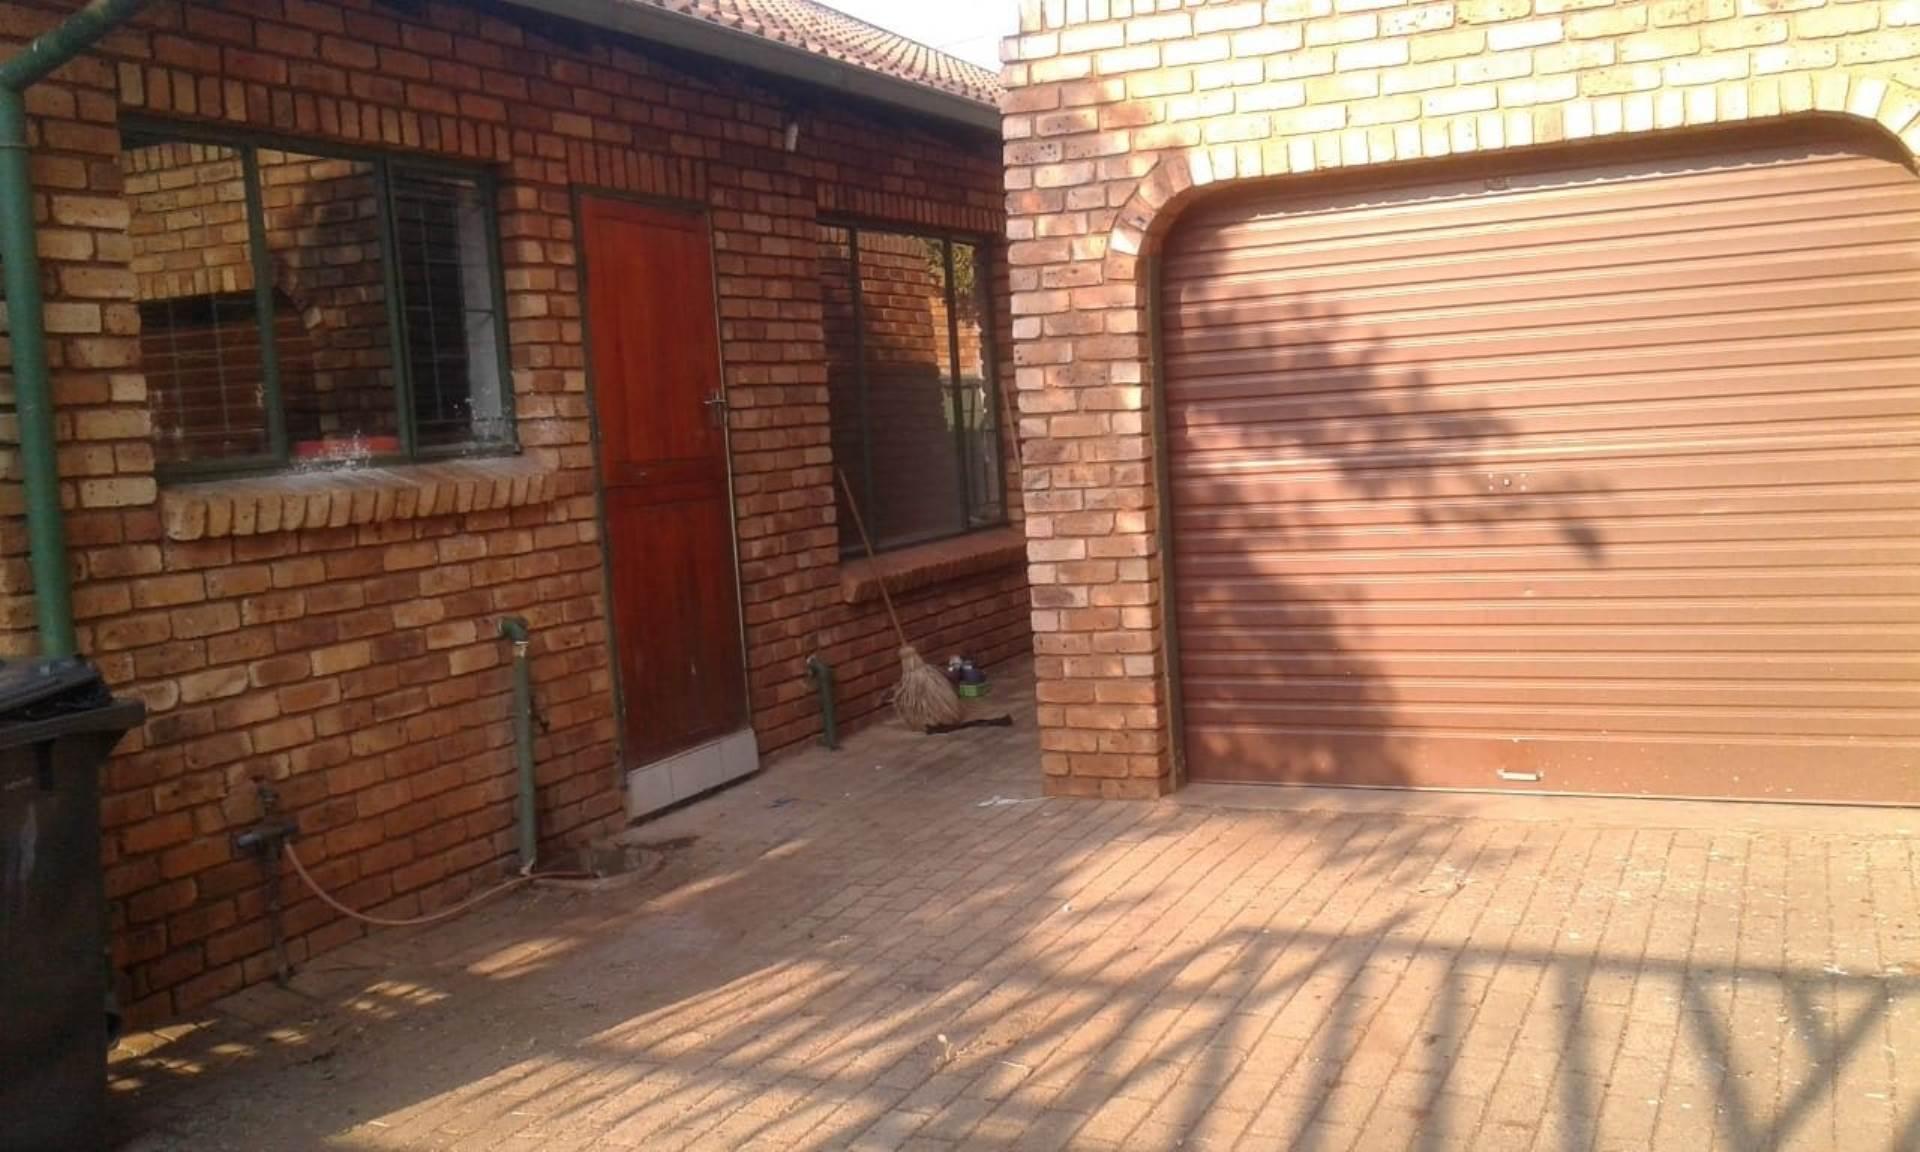 Akasia, Hesteapark Property  | Houses For Sale Hesteapark, HESTEAPARK, Townhouse 3 bedrooms property for sale Price:795,000